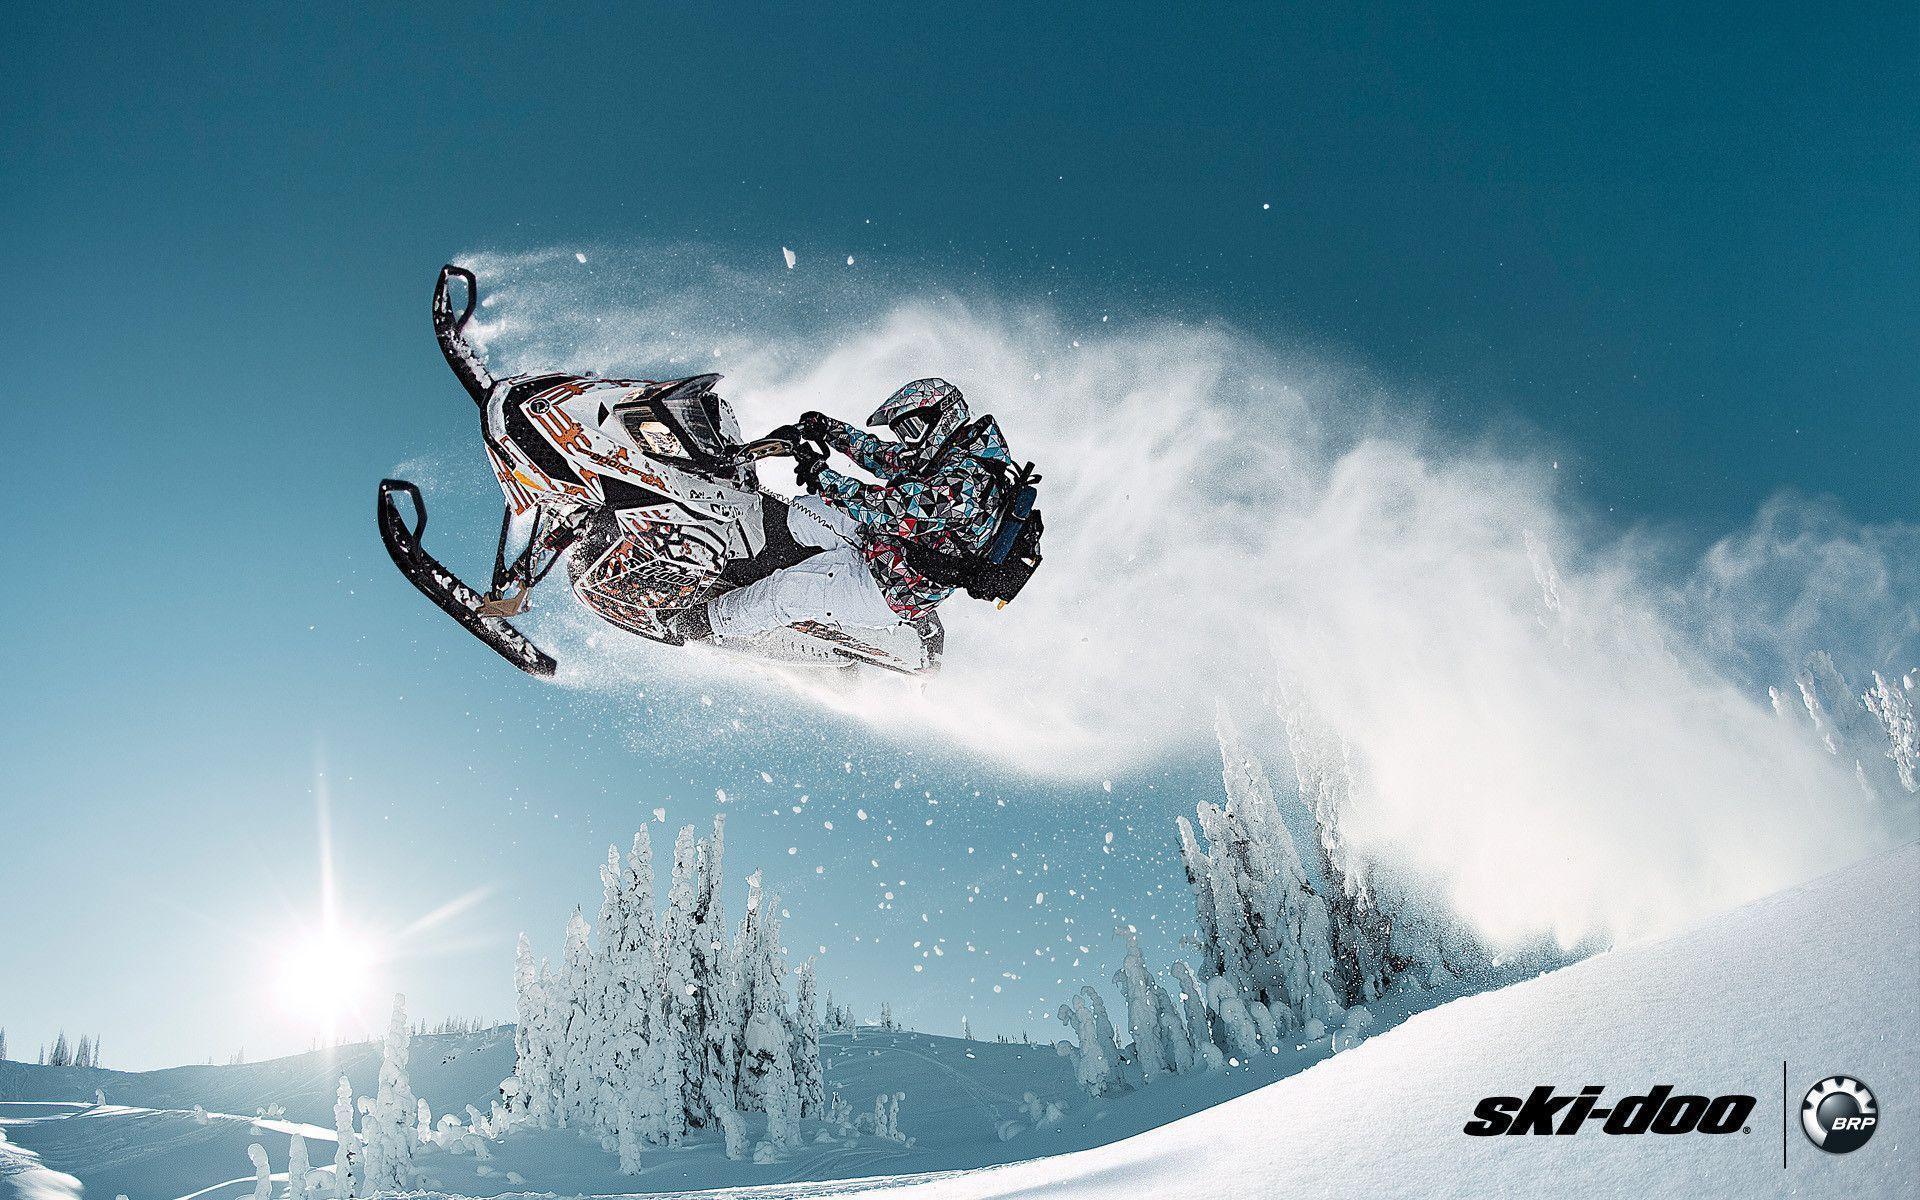 ski doo wallpaper  Ski-Doo Wallpapers - Wallpaper Cave